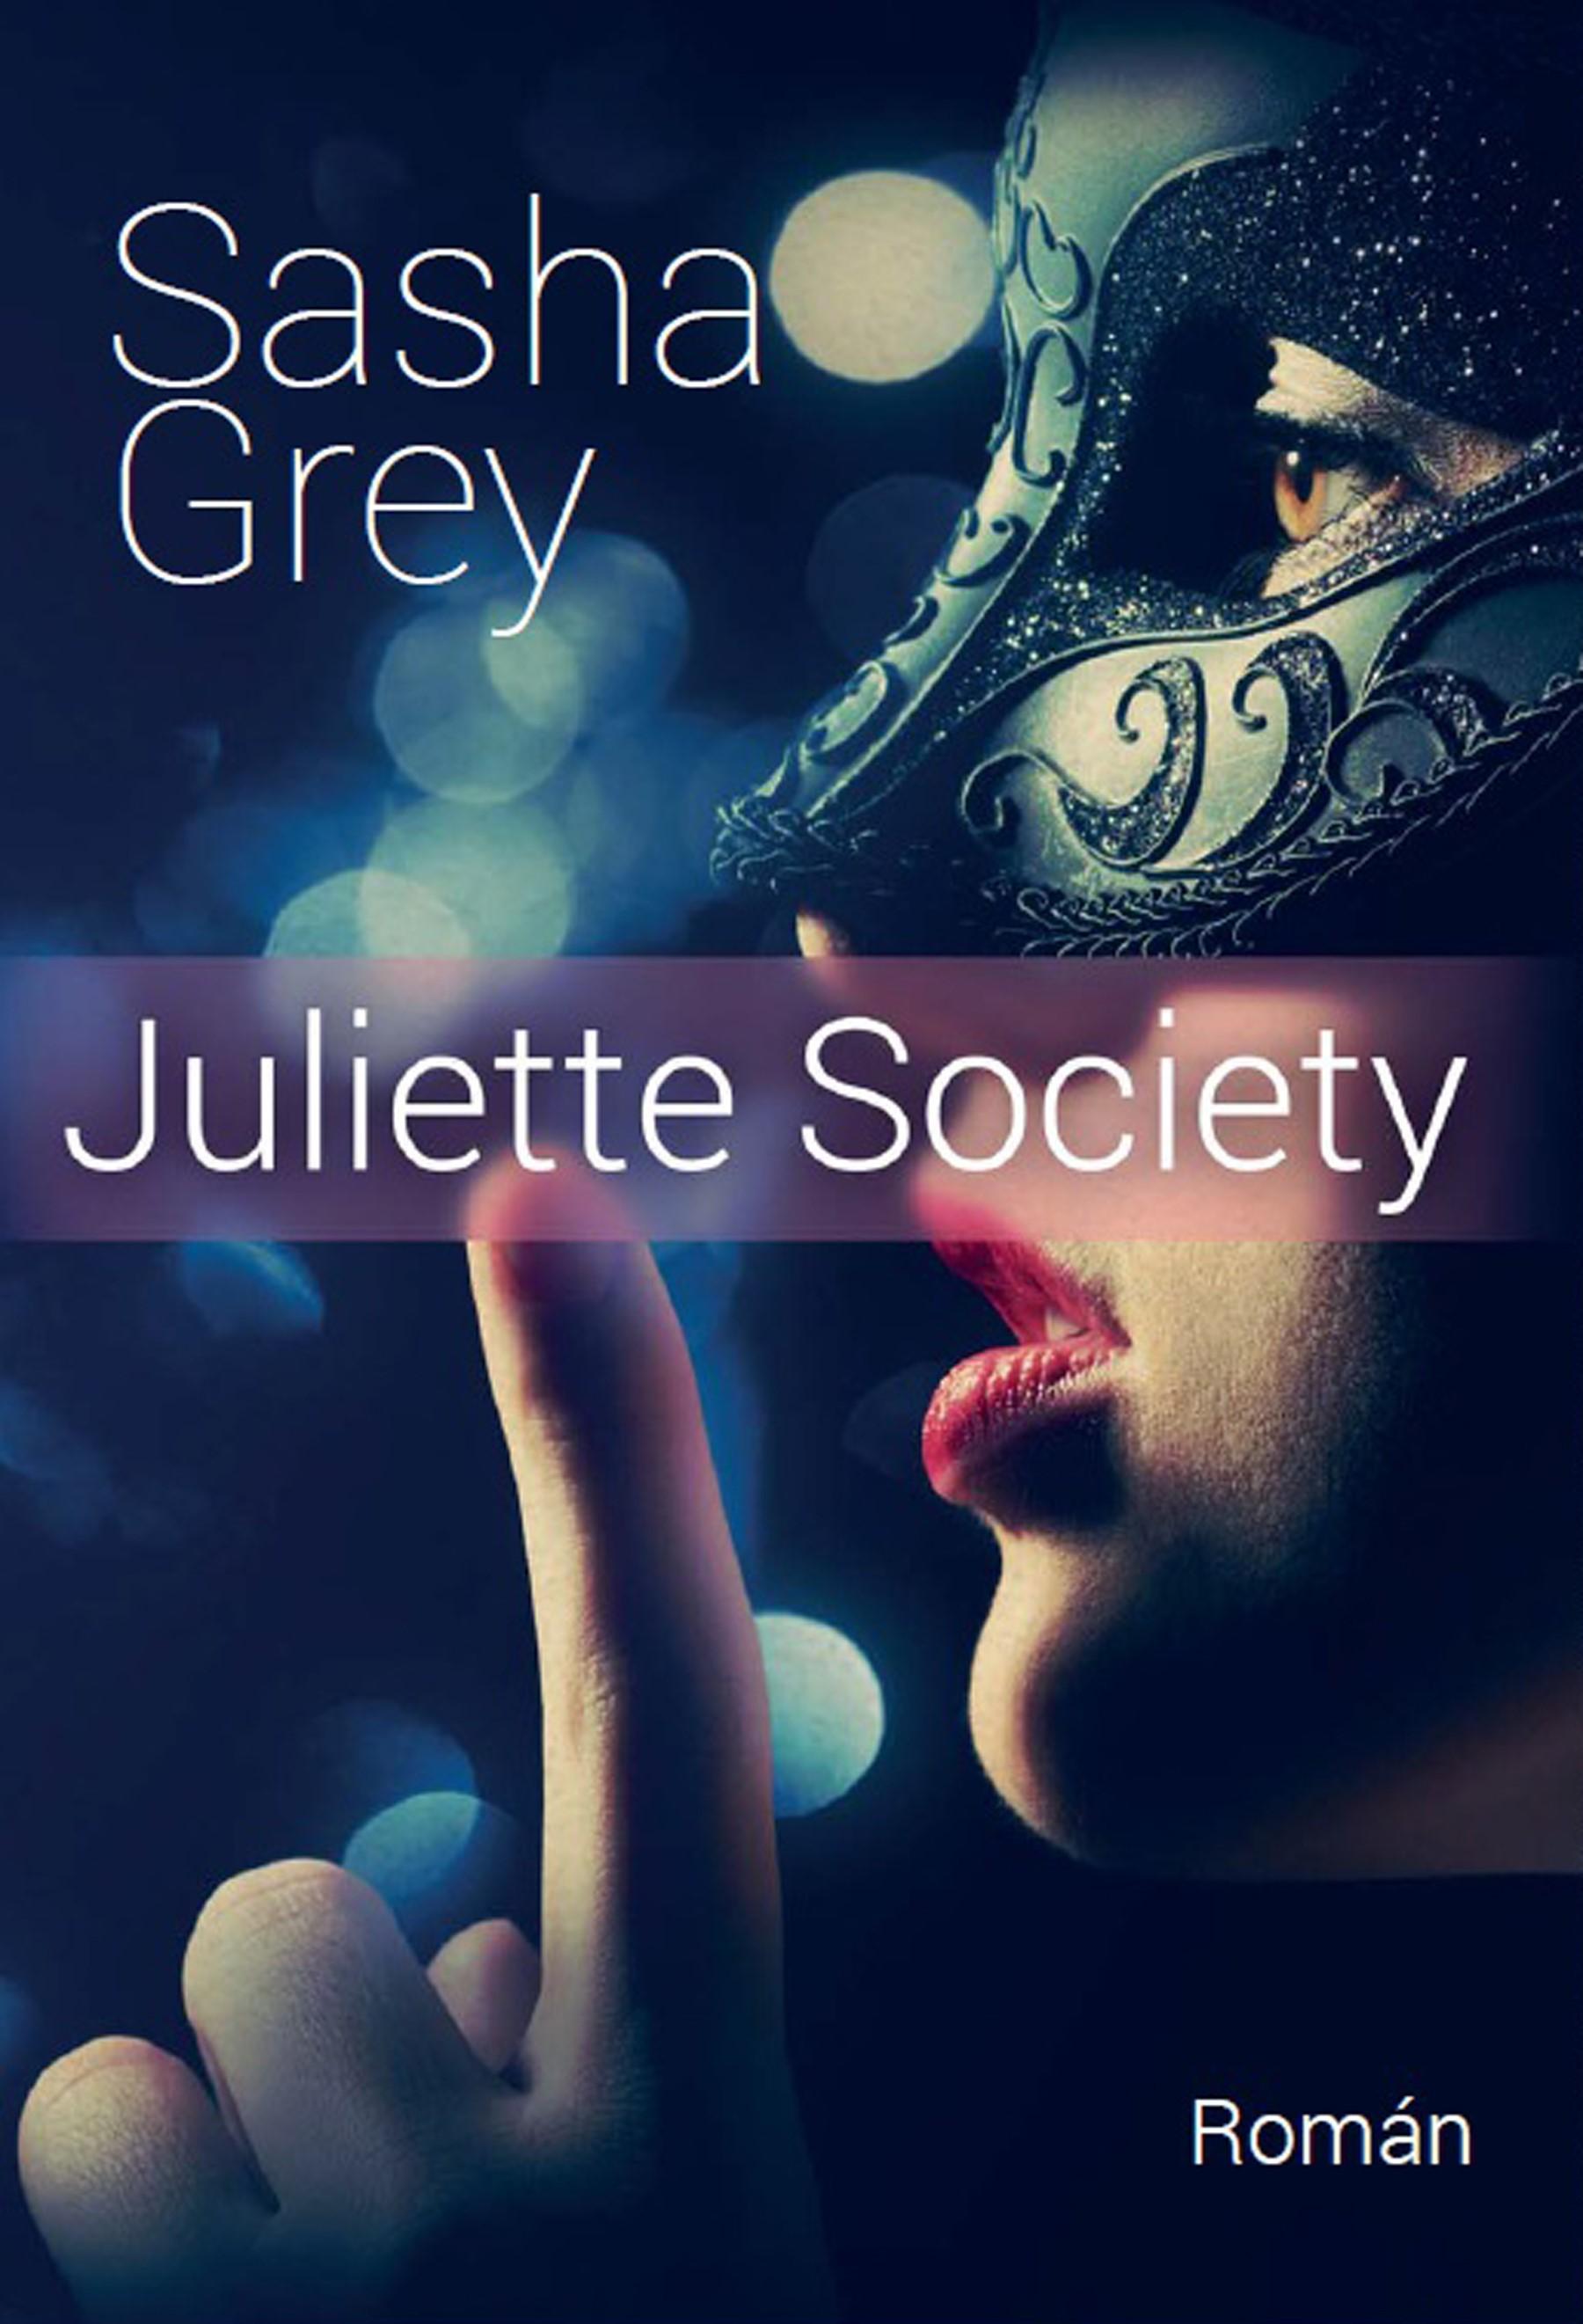 Juliette Society | Sasha Grey